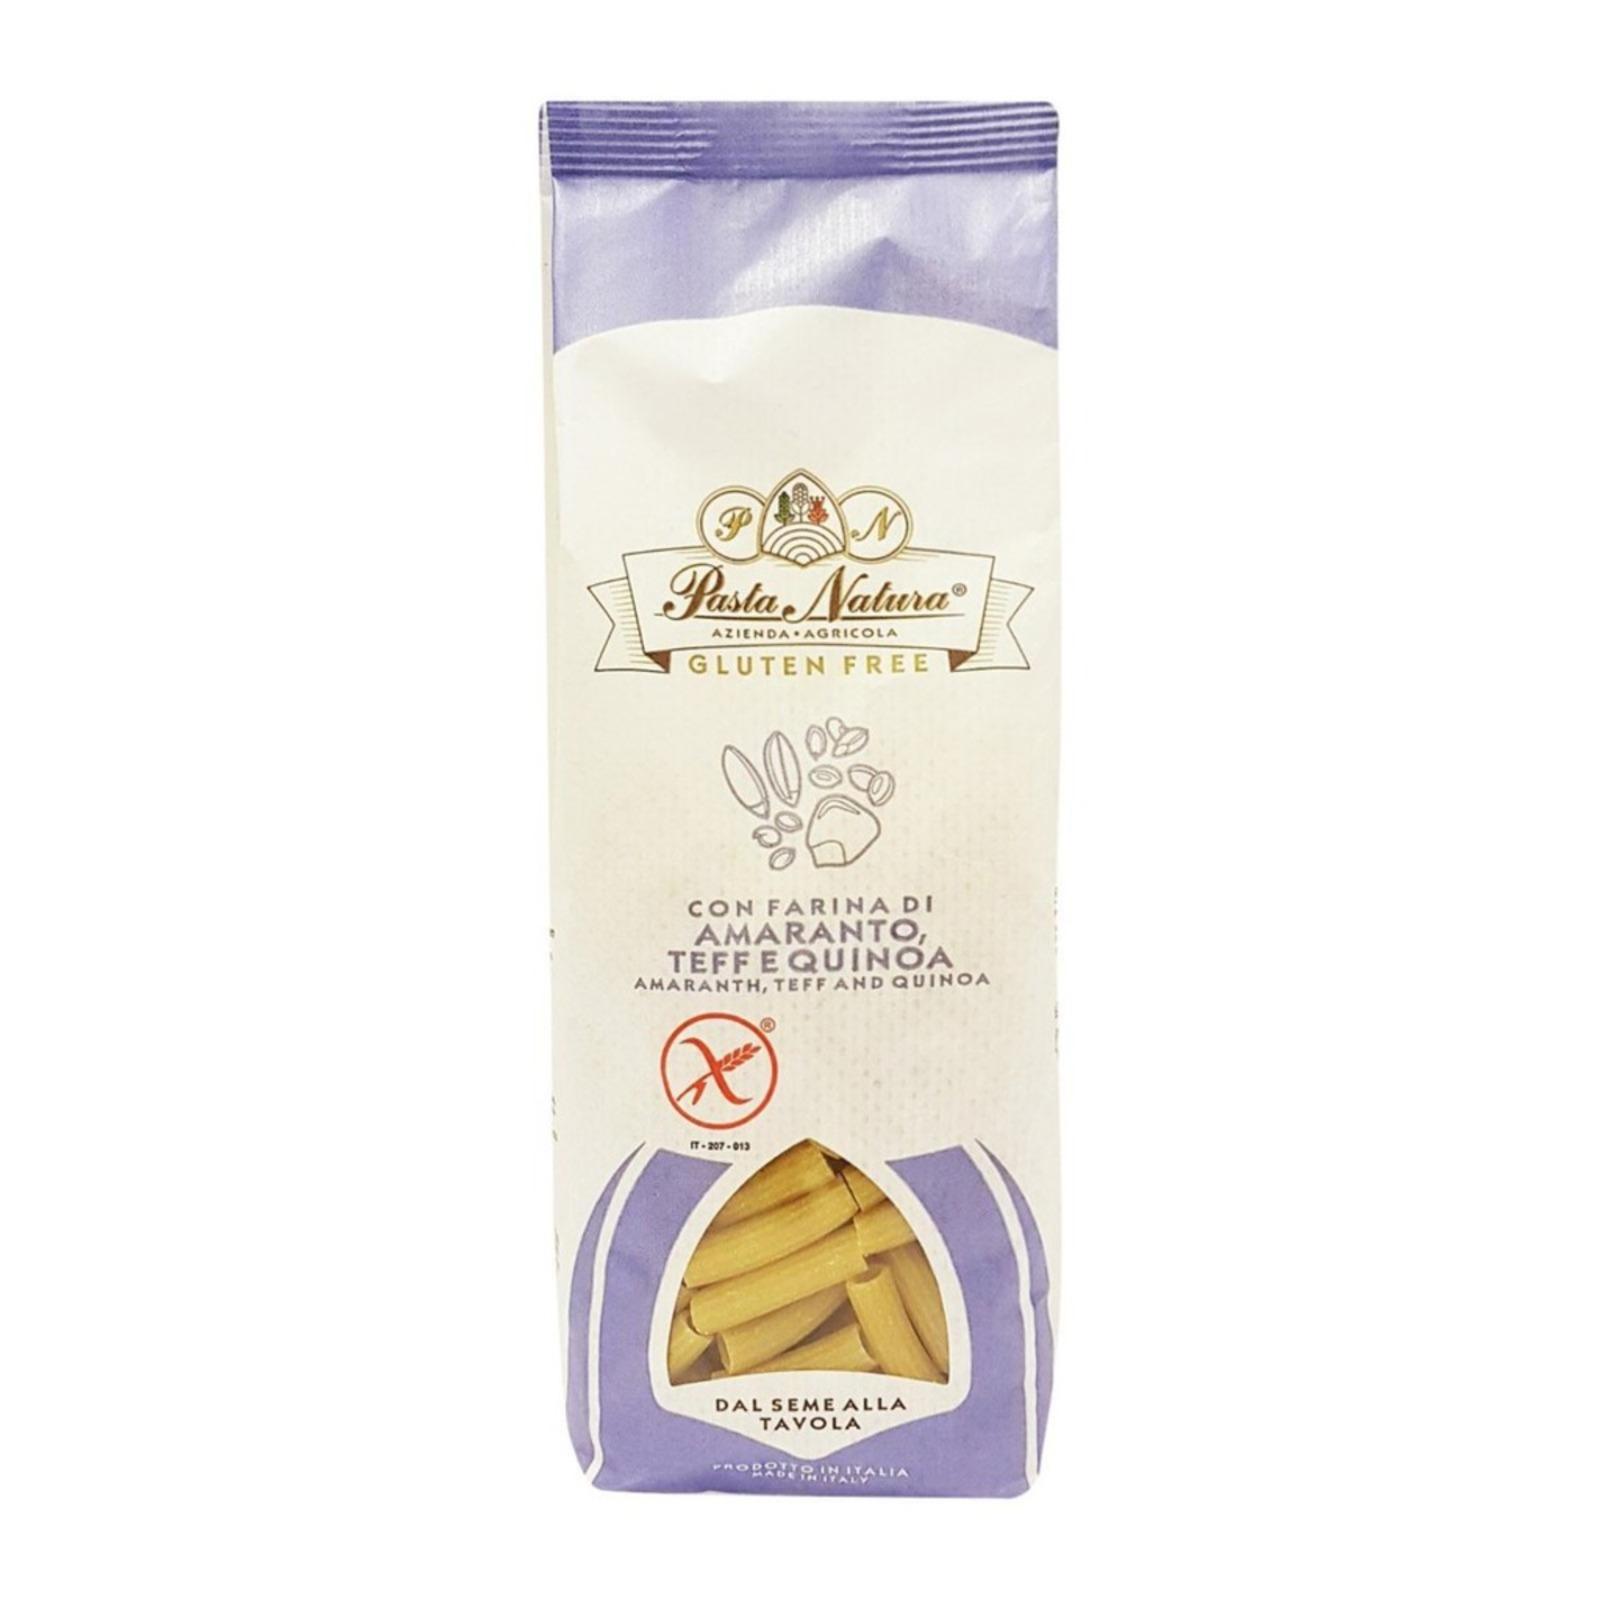 Pasta Natura Gluten Free Amaranto, Teff & Quinoa Penne